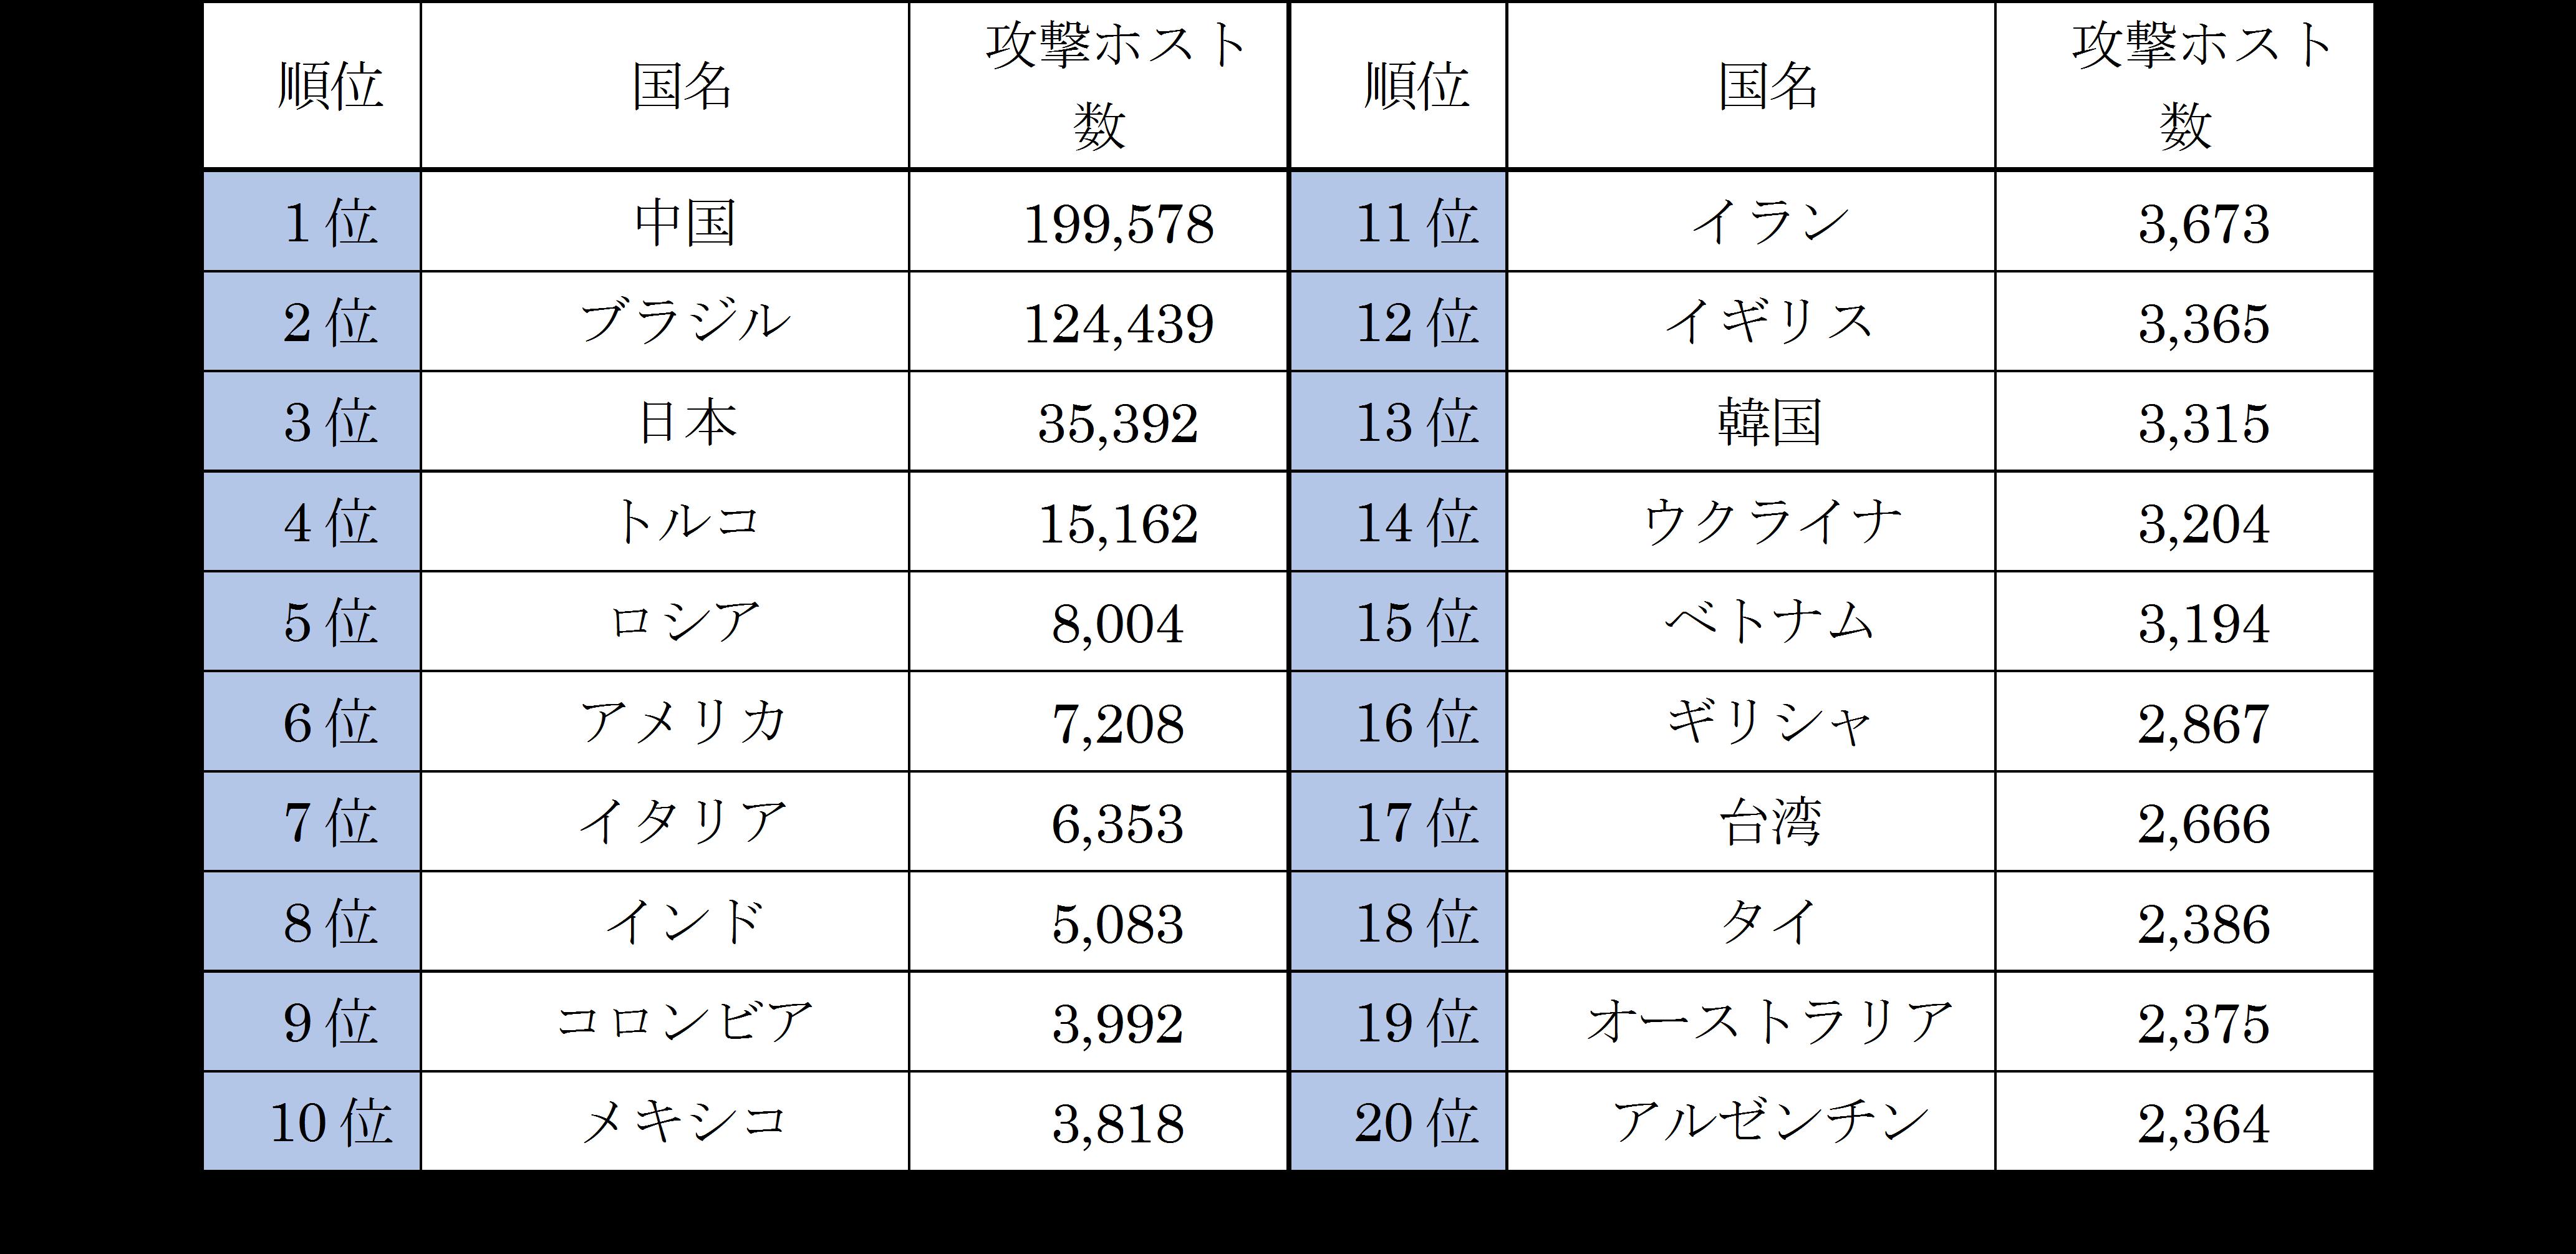 攻撃ホスト数国別順位